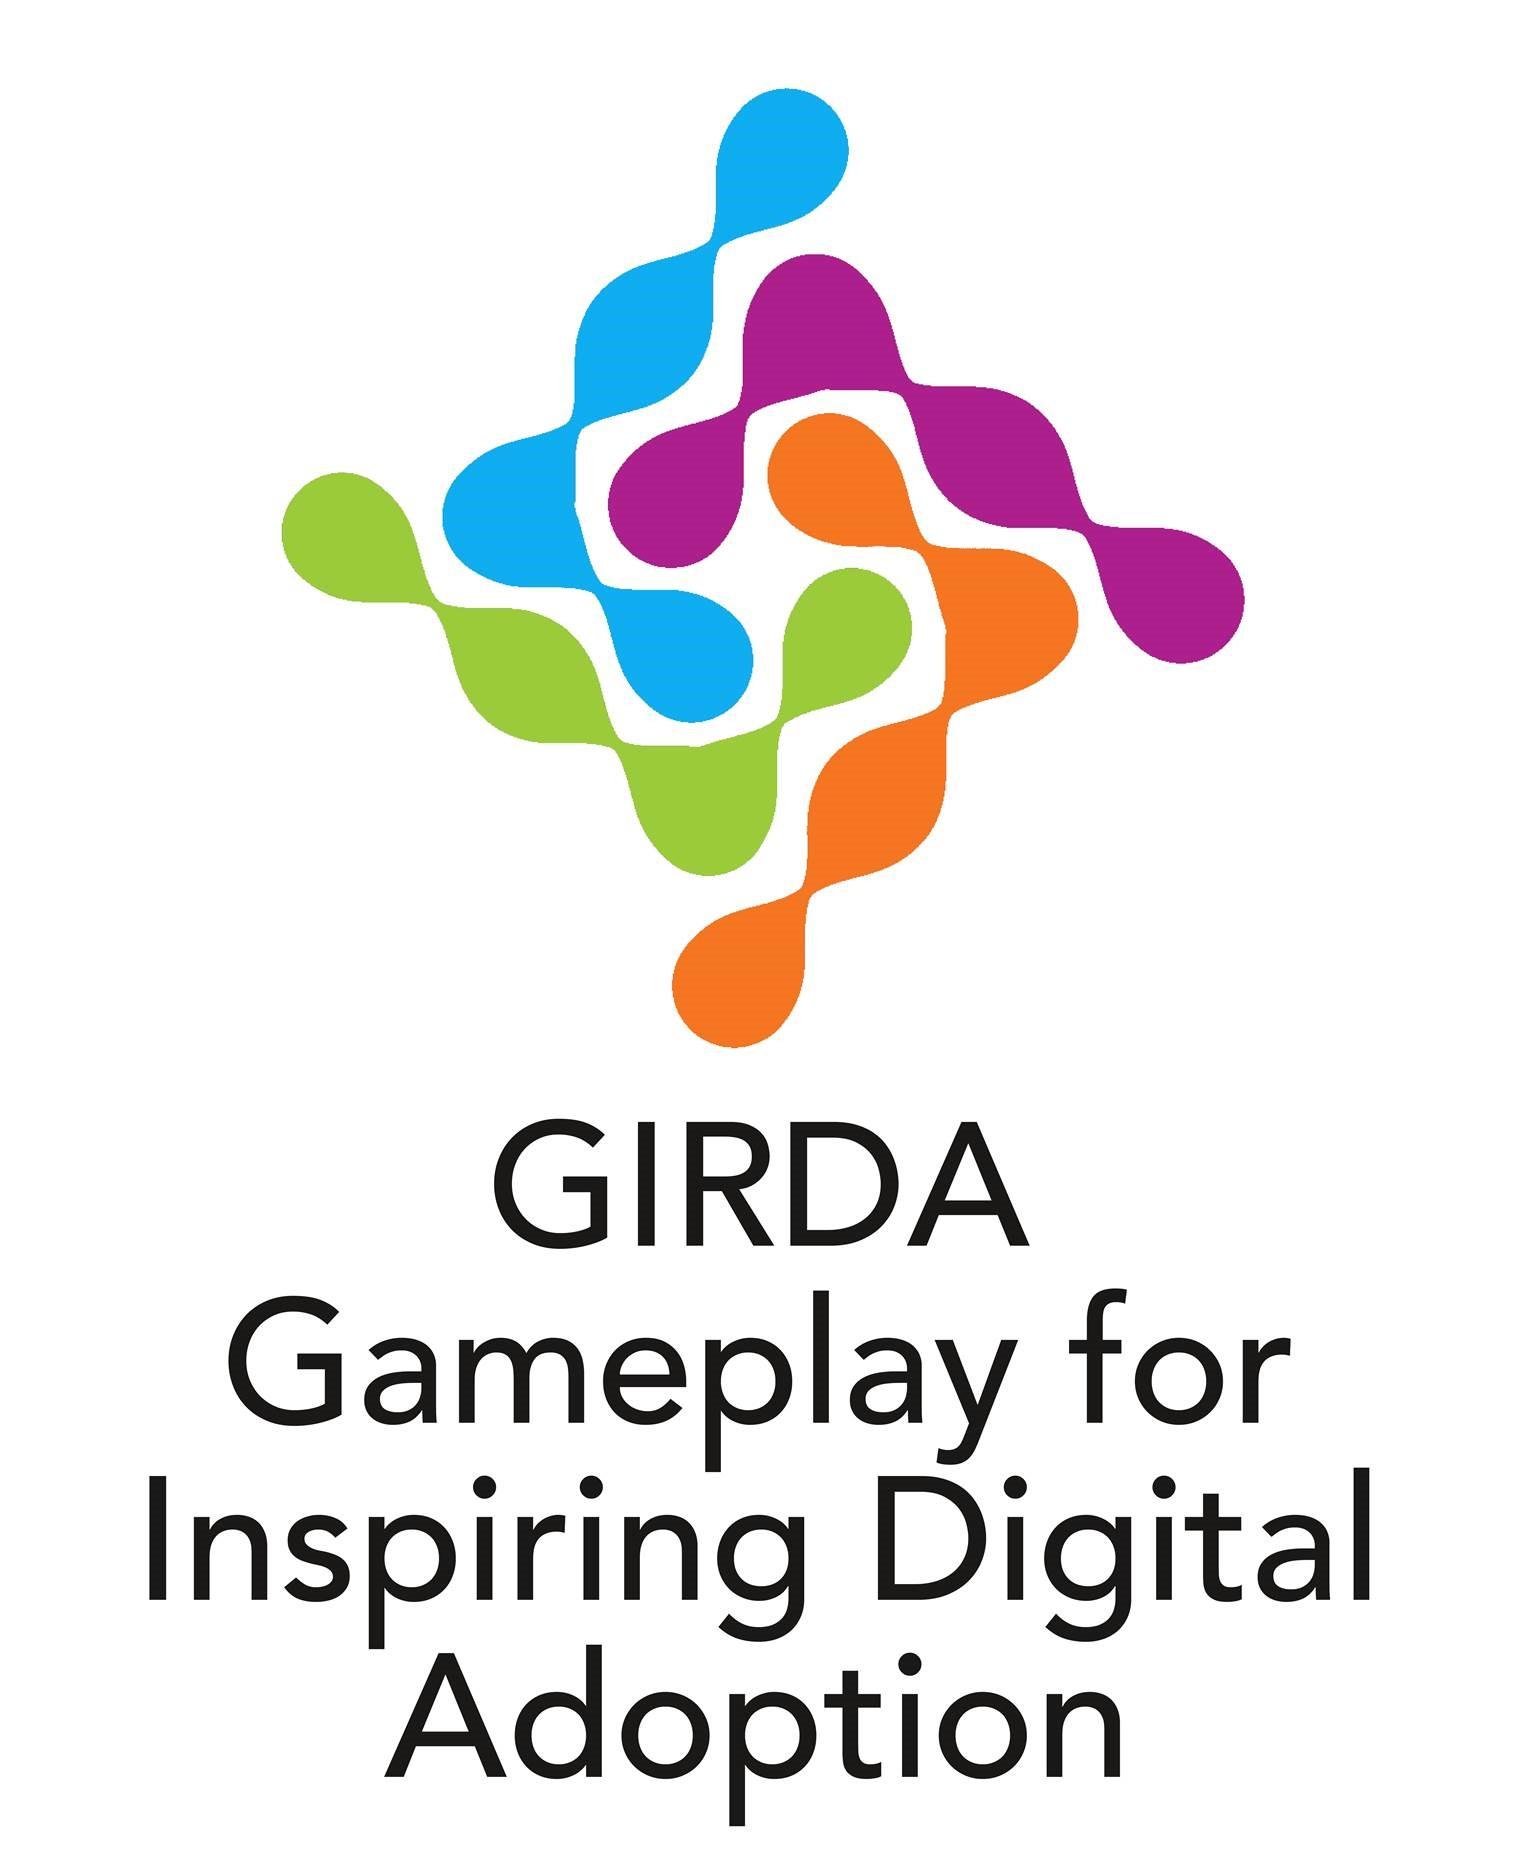 GIRDA logo